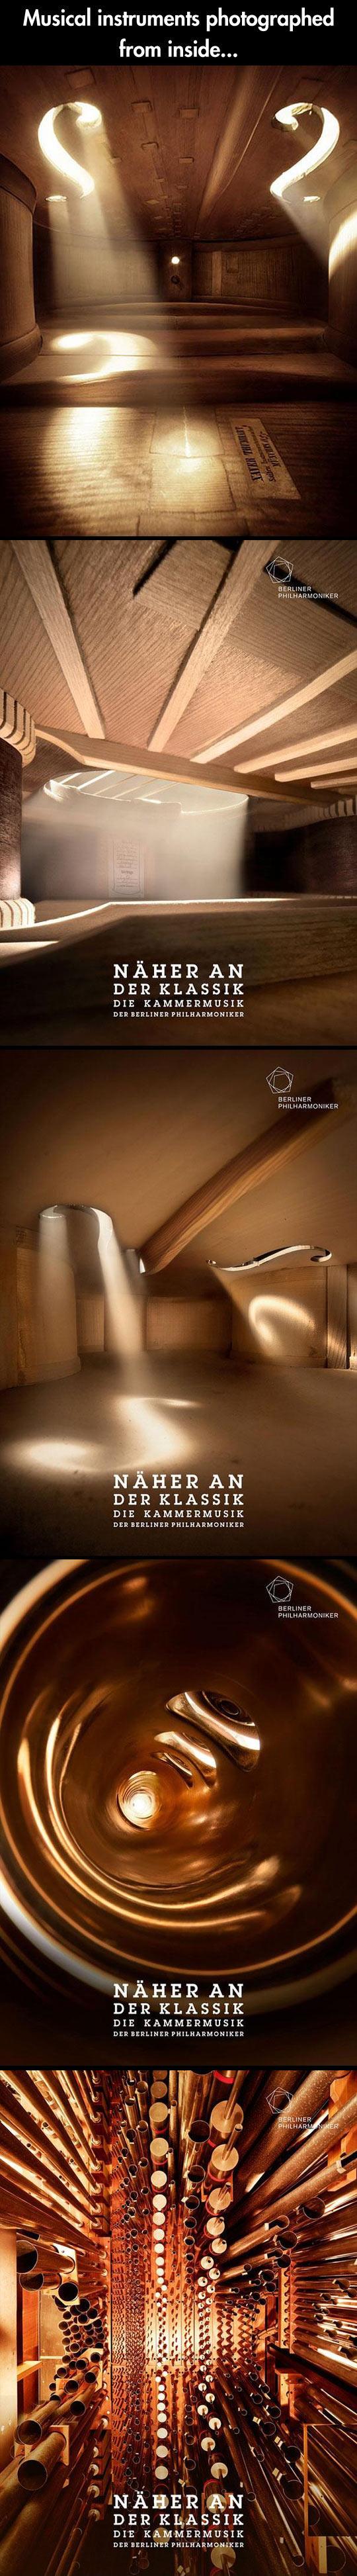 instruments-photo-taken-from-inside